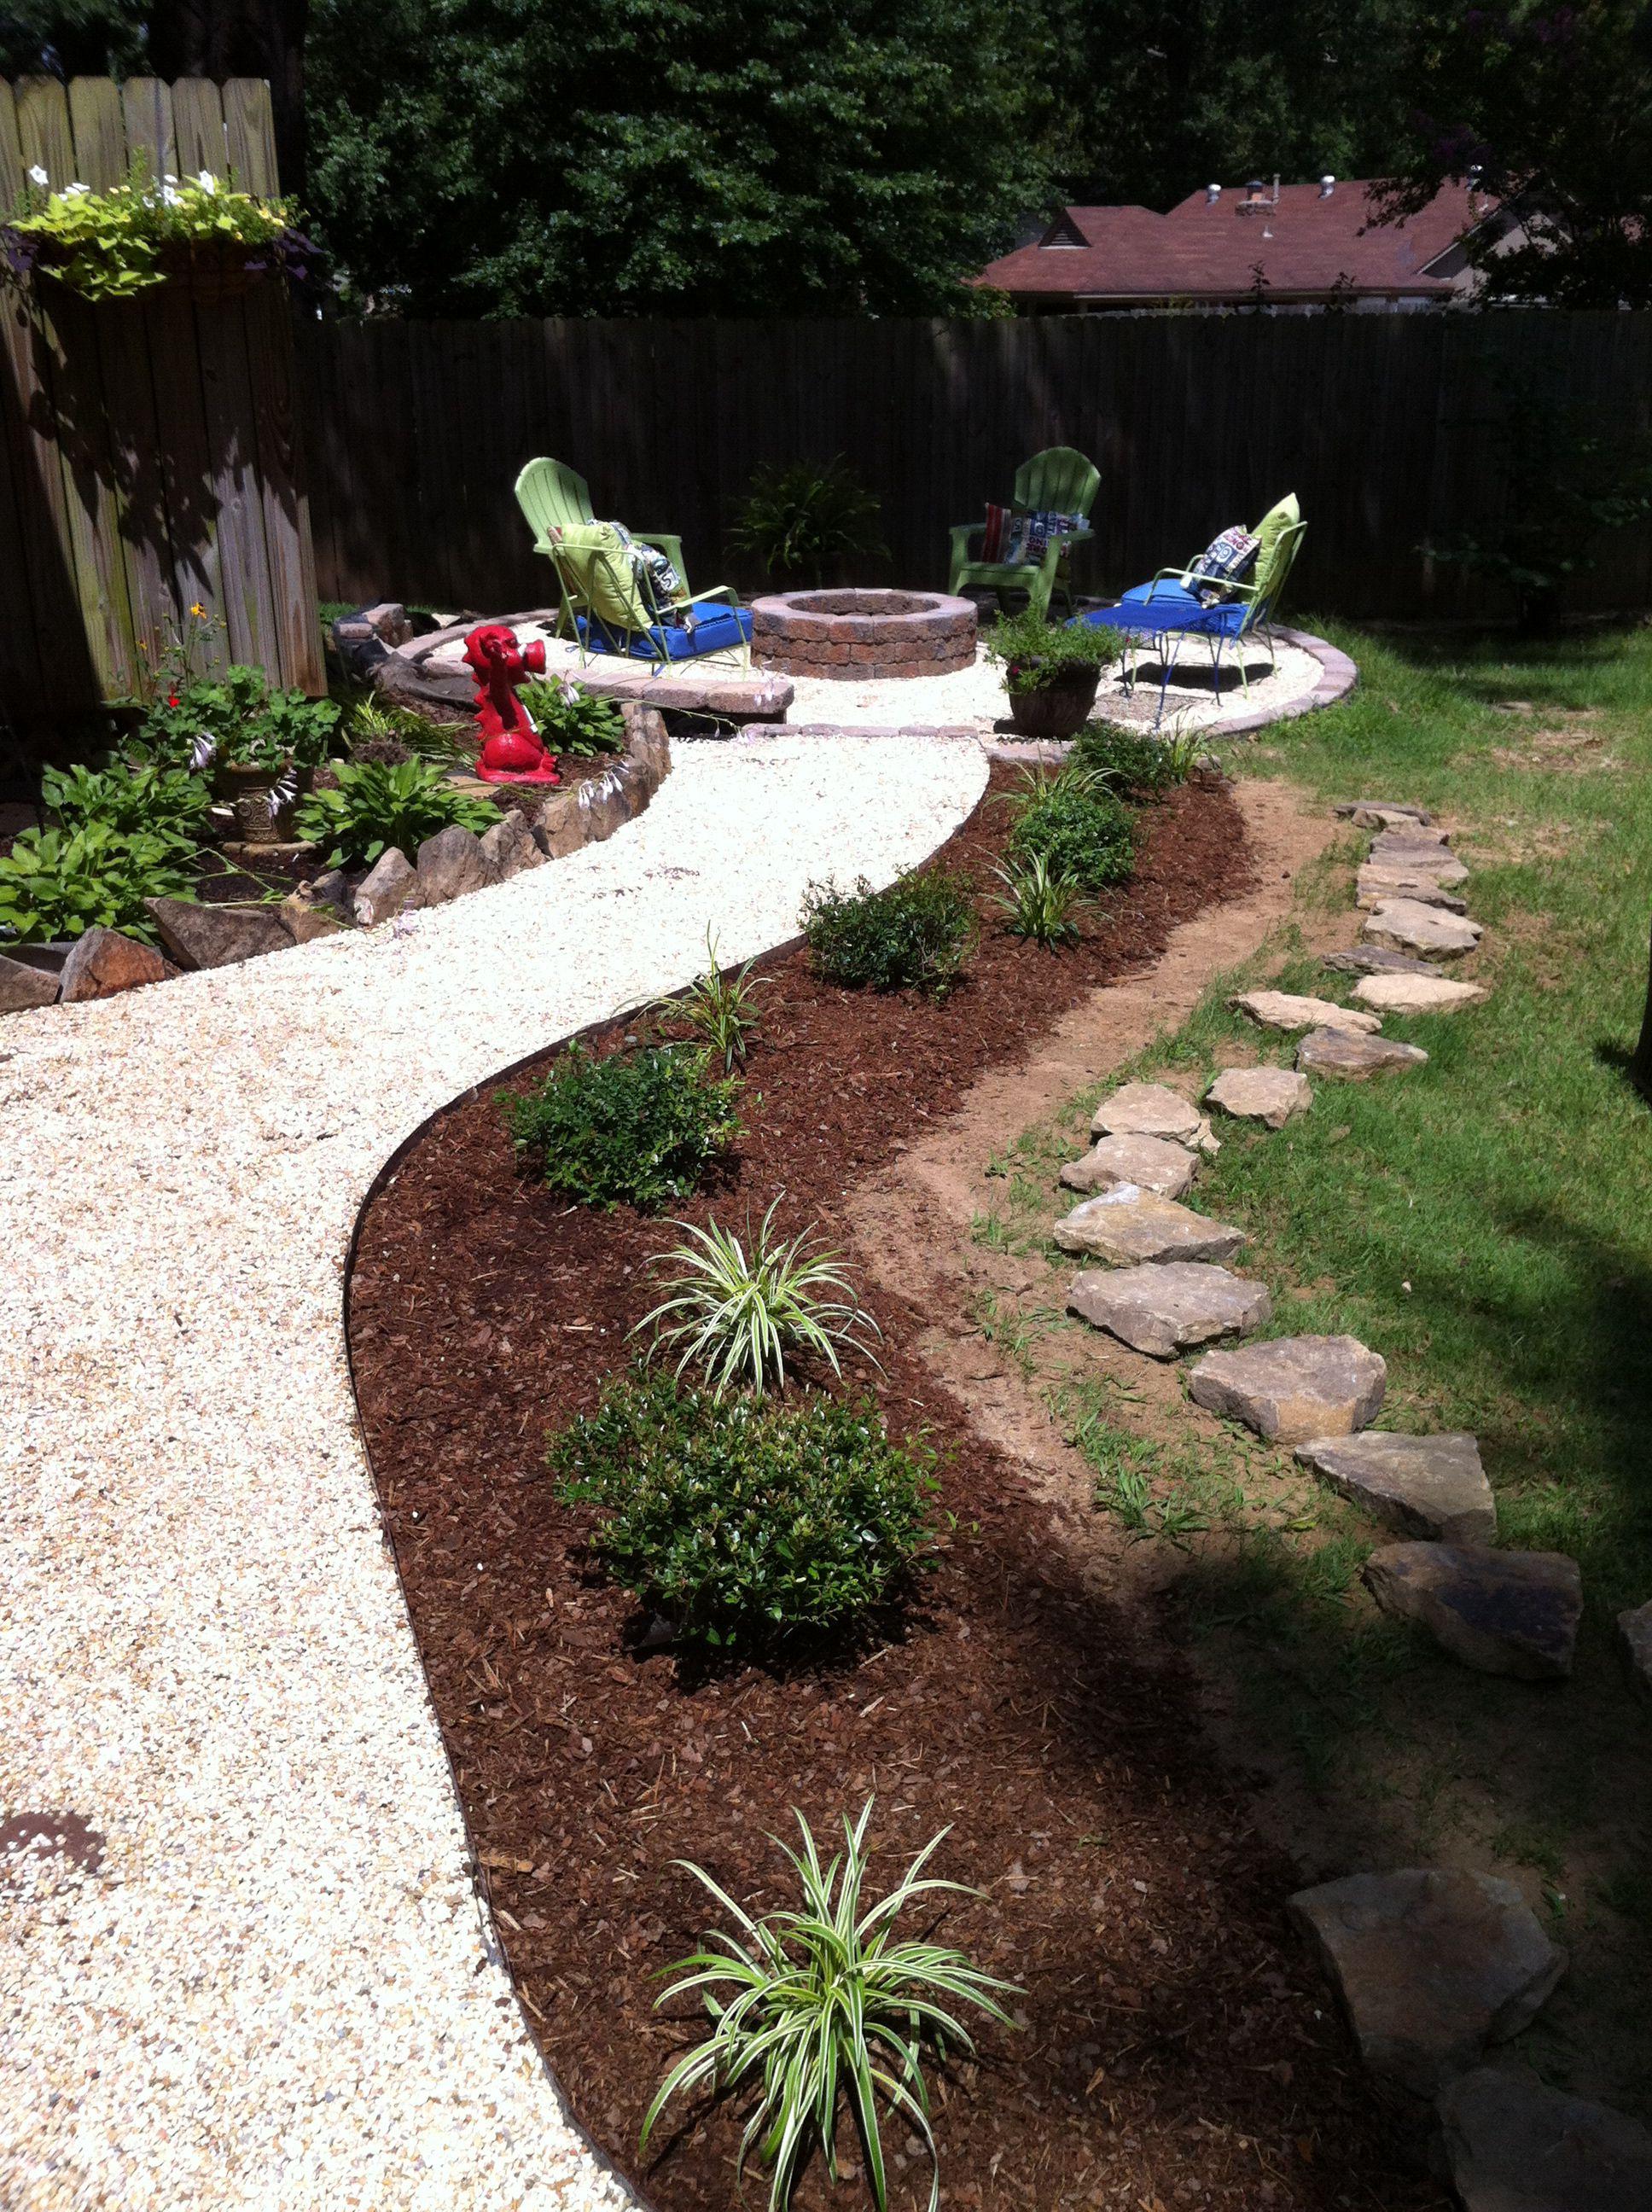 New flower bed Pea gravel patio, Gravel patio, Summer